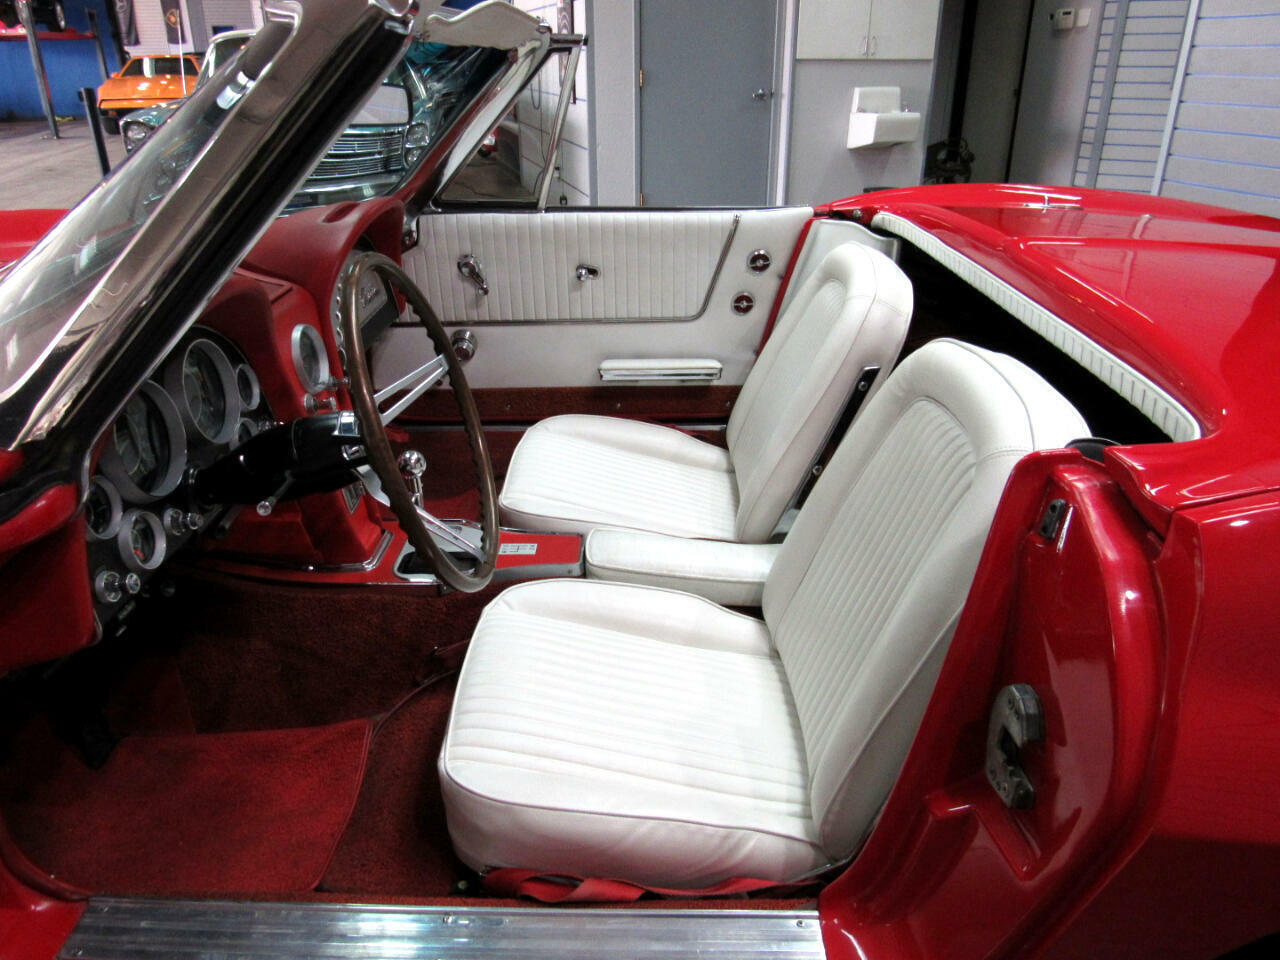 1964 Red Chevrolet Corvette Convertible  | C2 Corvette Photo 8